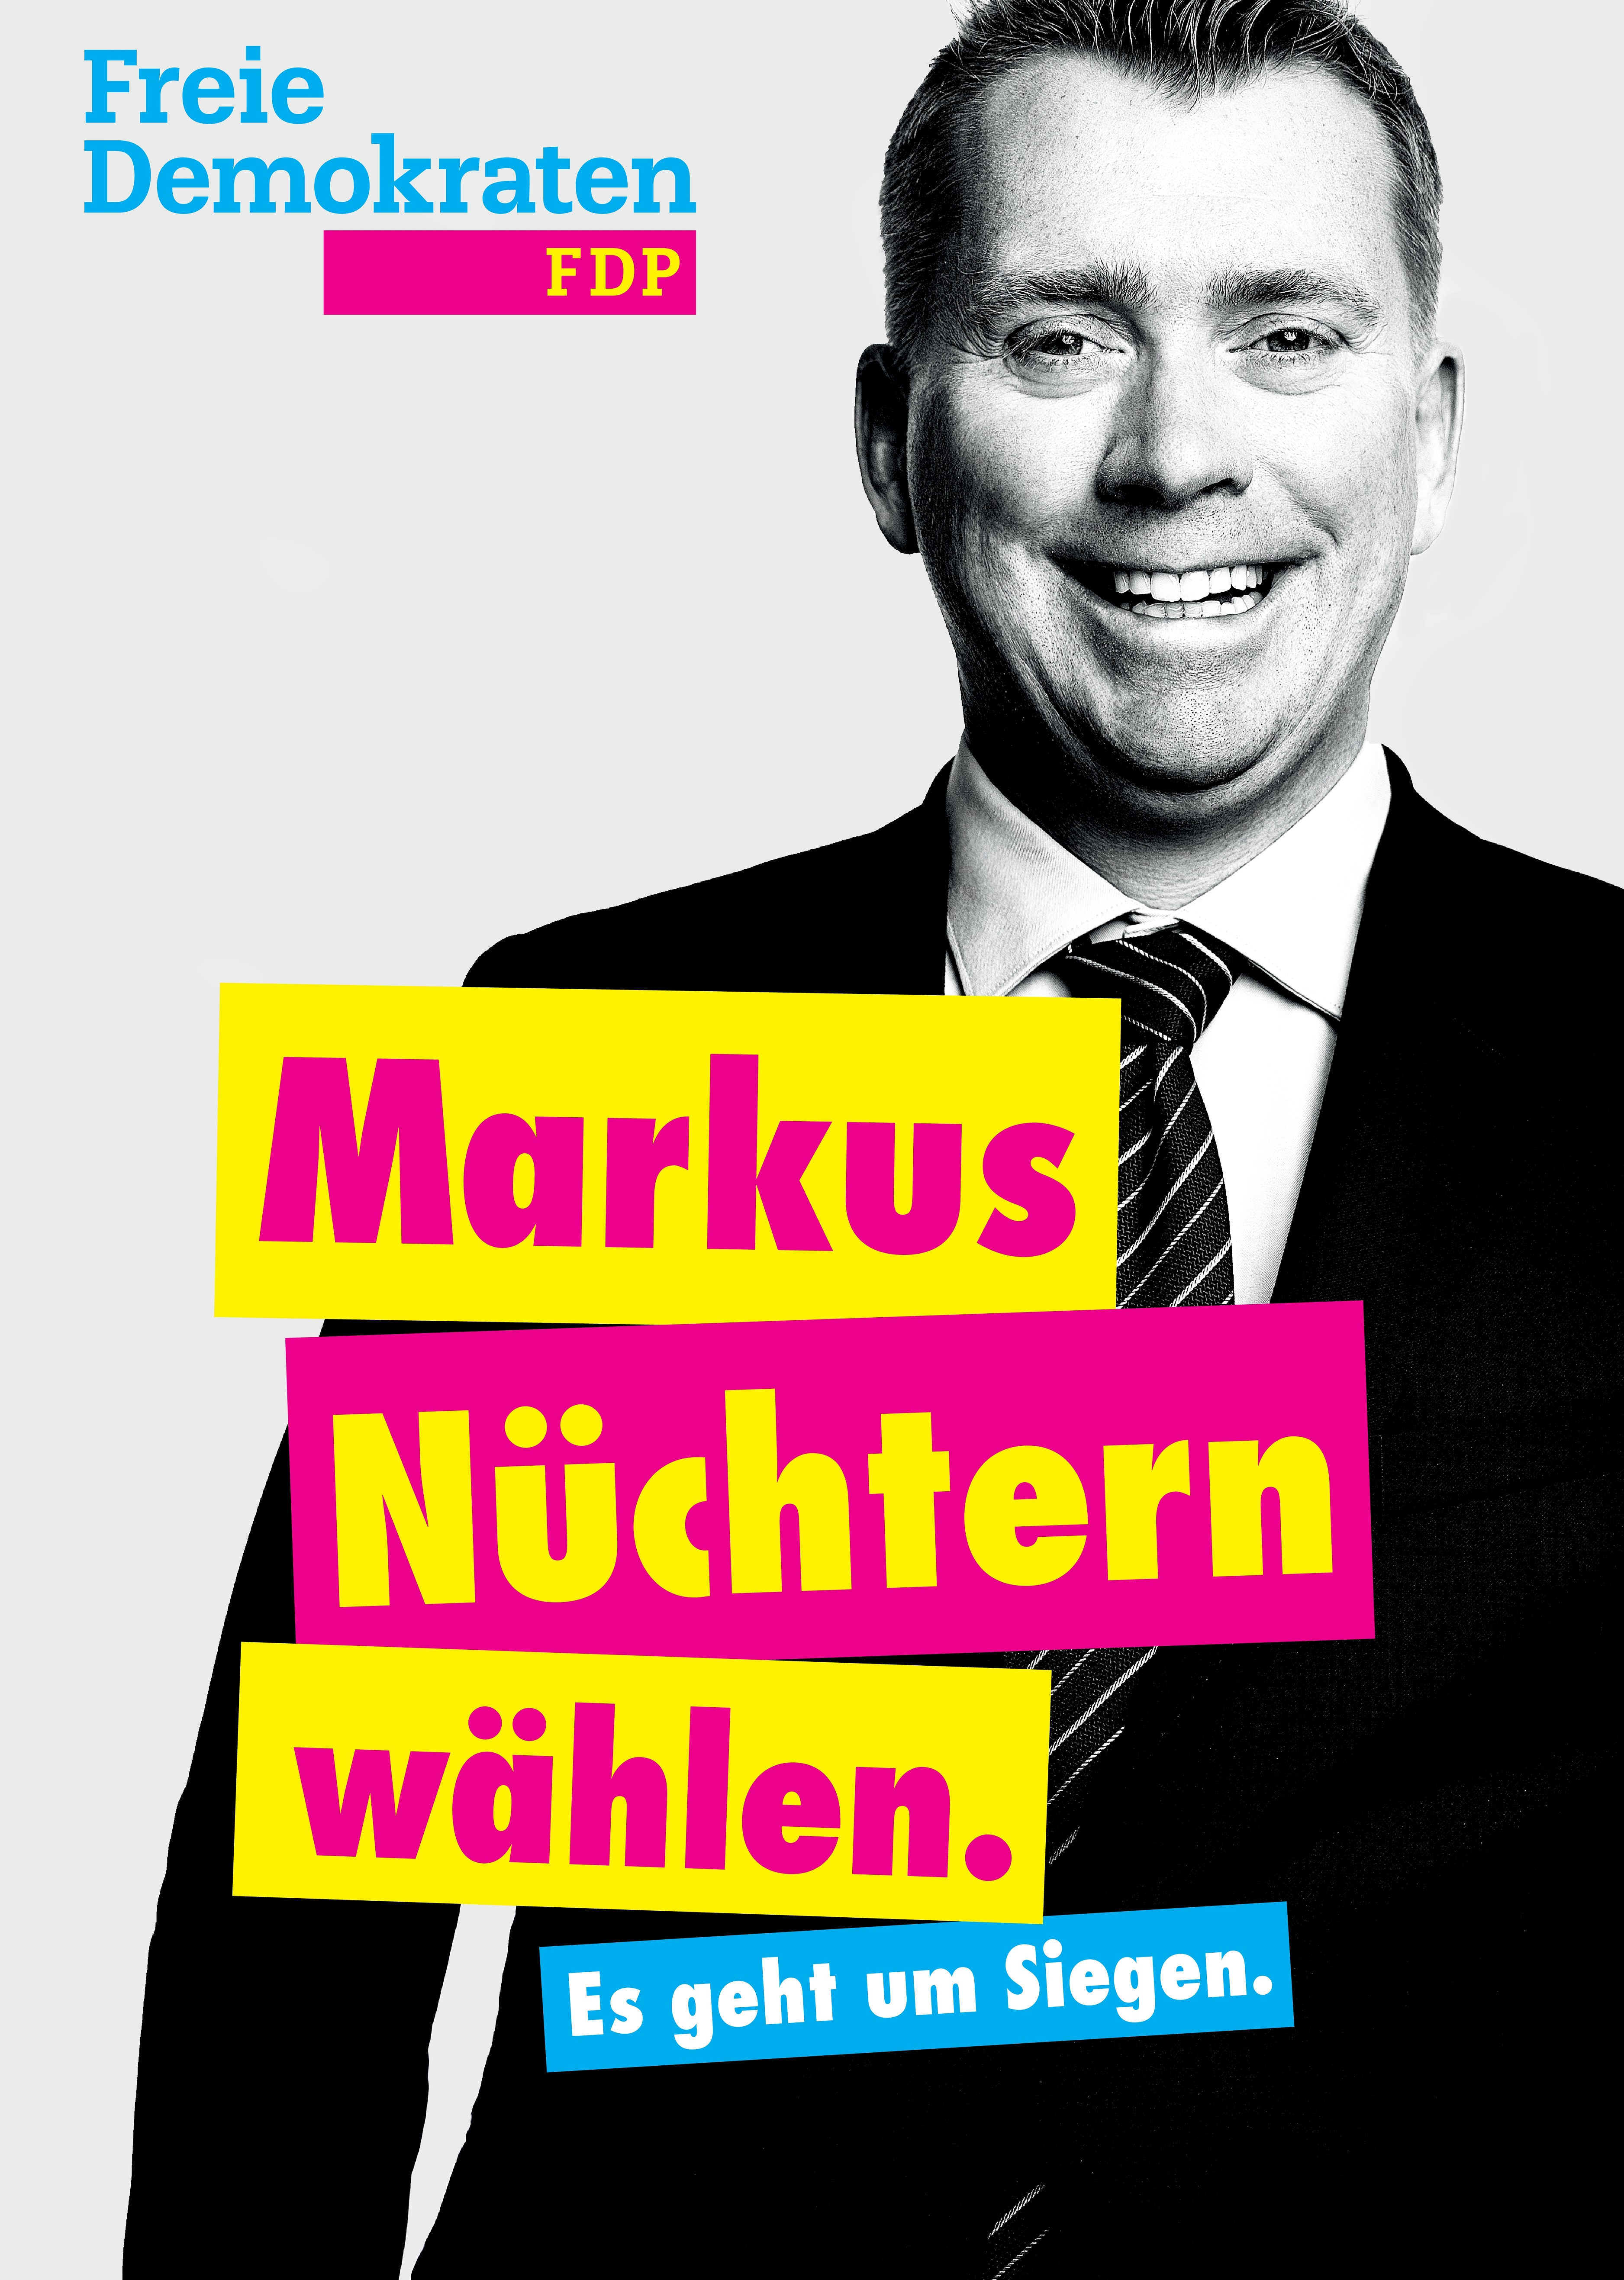 Markus Nüchtern